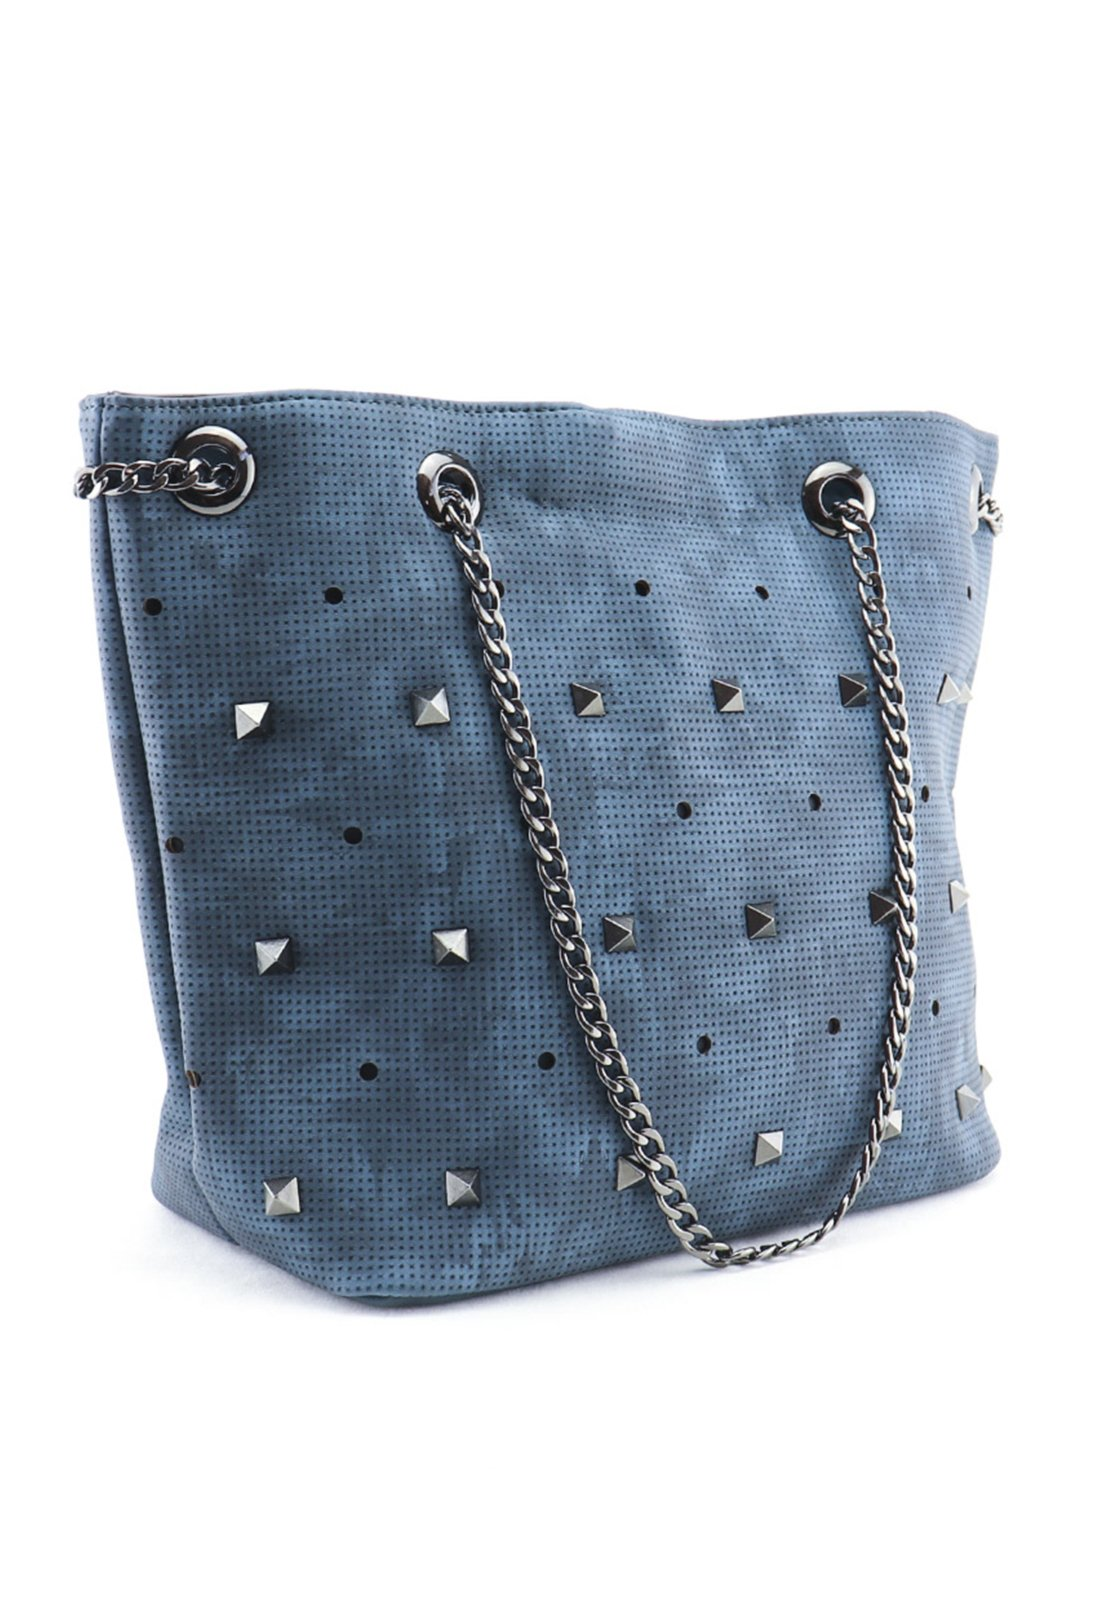 Bolsa Feminina Baumni Leslie Transversal Lateral Azul - Compre Agora